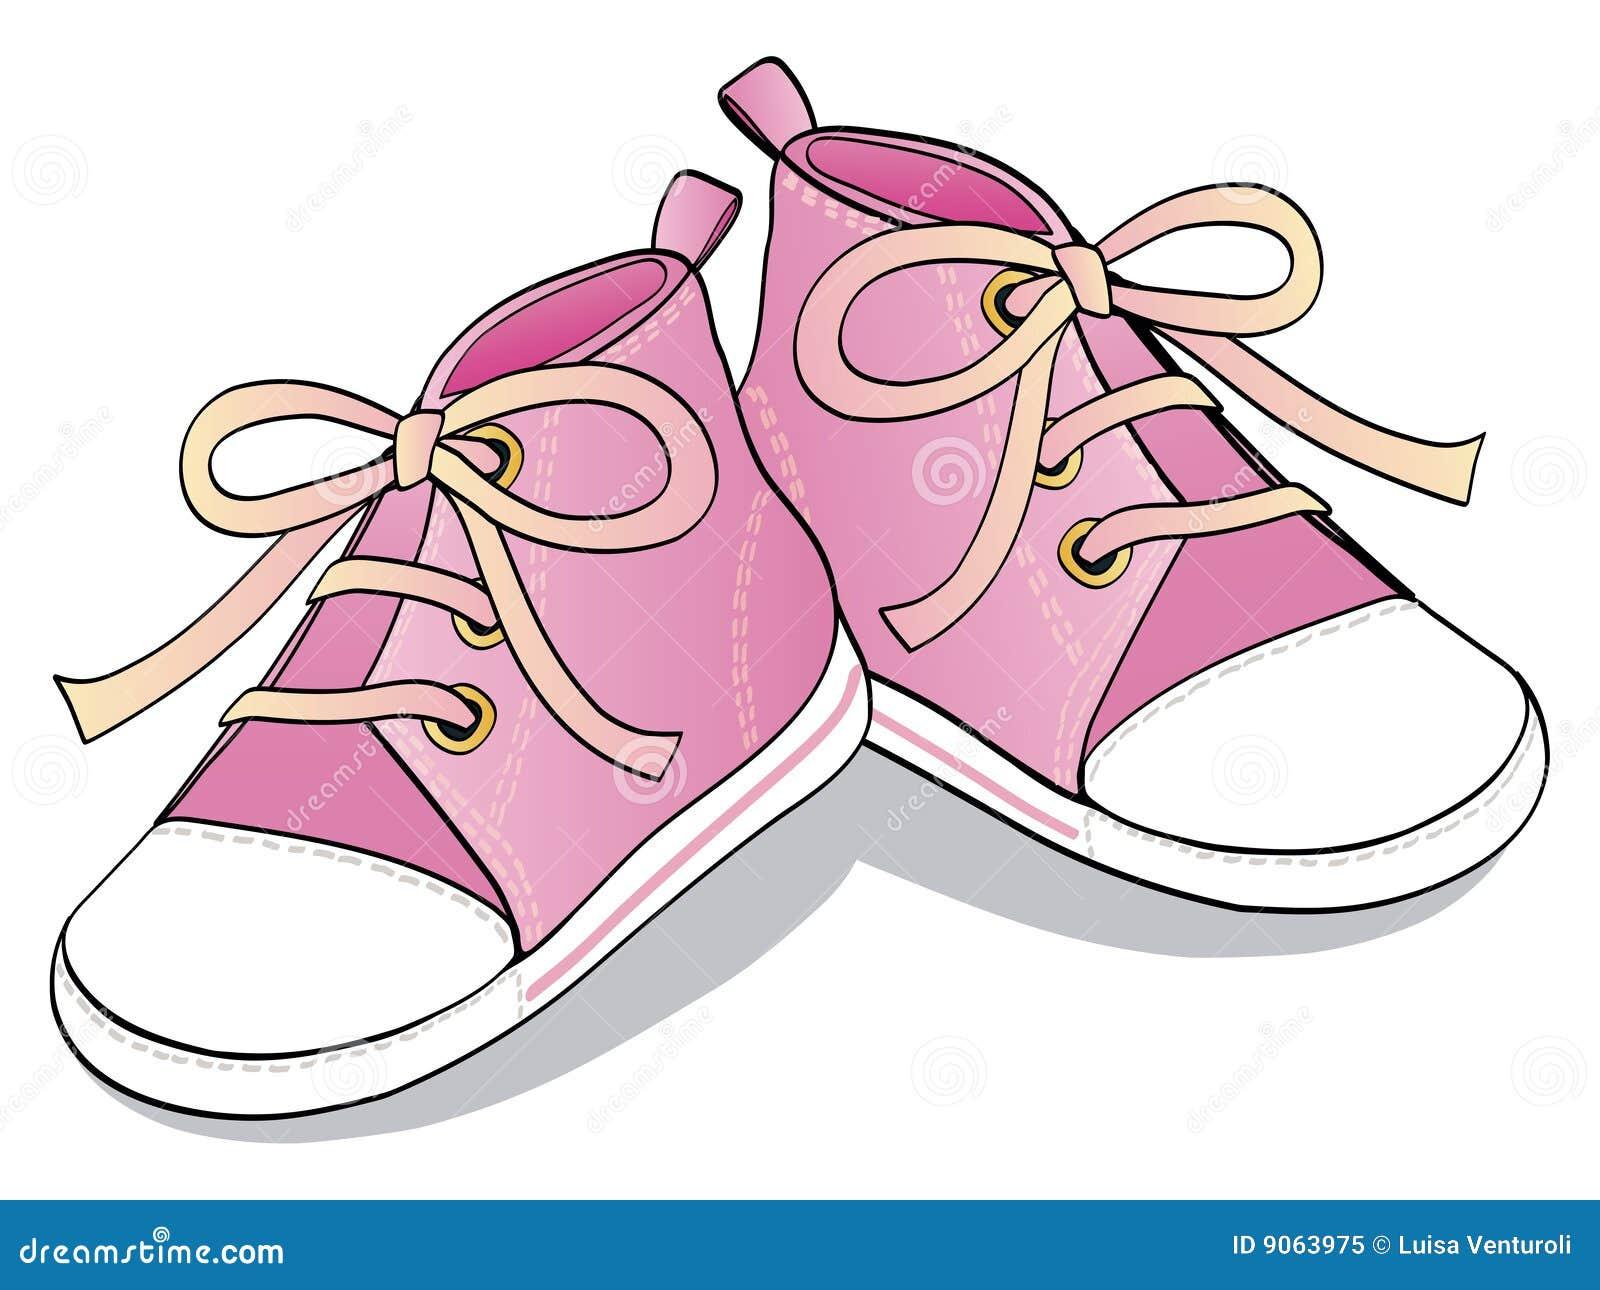 Free Walking Shoe Clipart